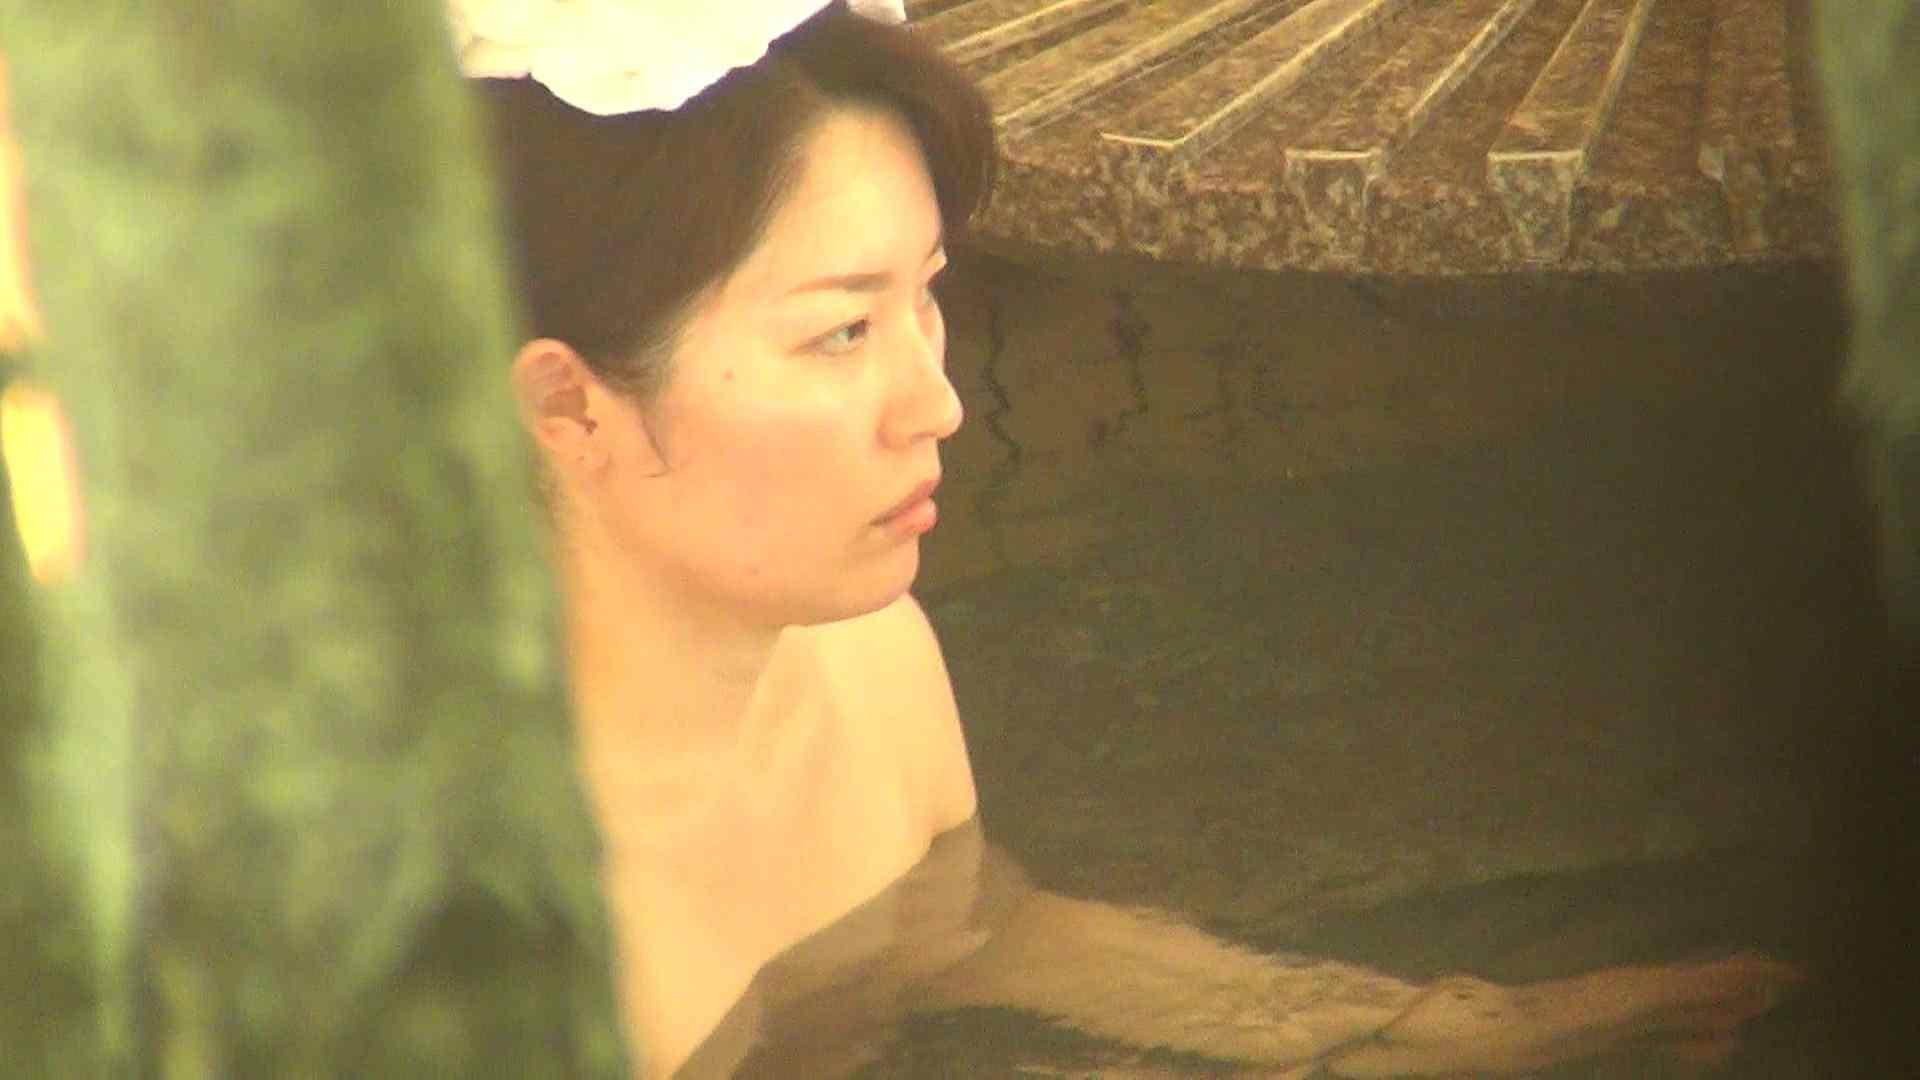 Aquaな露天風呂Vol.301 OLのエロ生活 すけべAV動画紹介 112連発 92